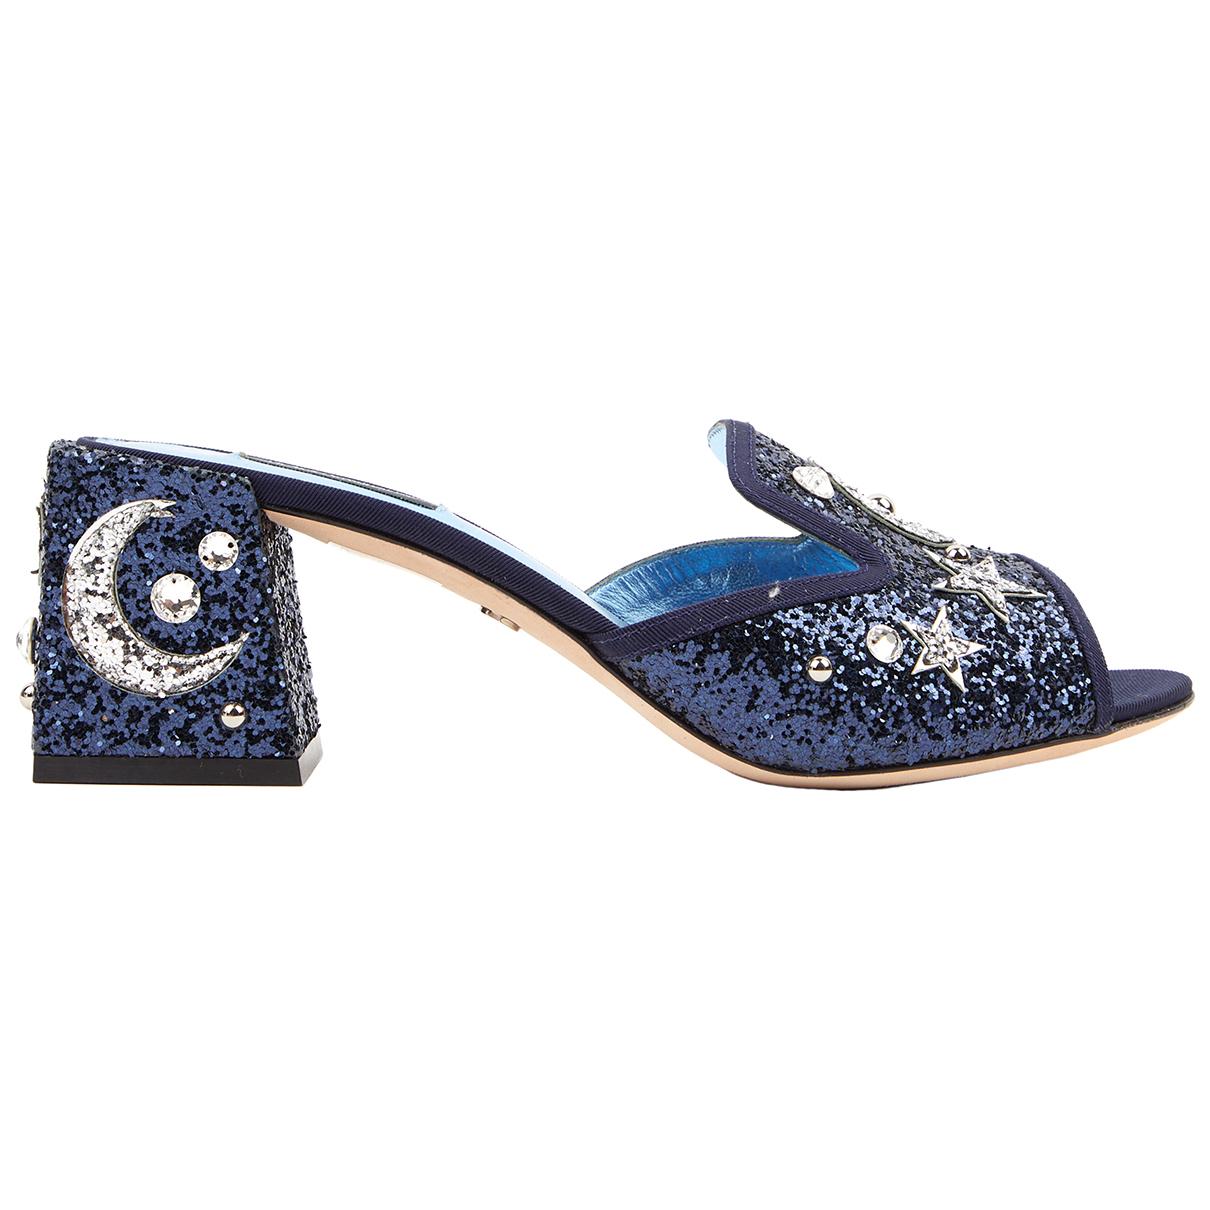 Dolce & Gabbana \N Navy Glitter Sandals for Women 40 IT